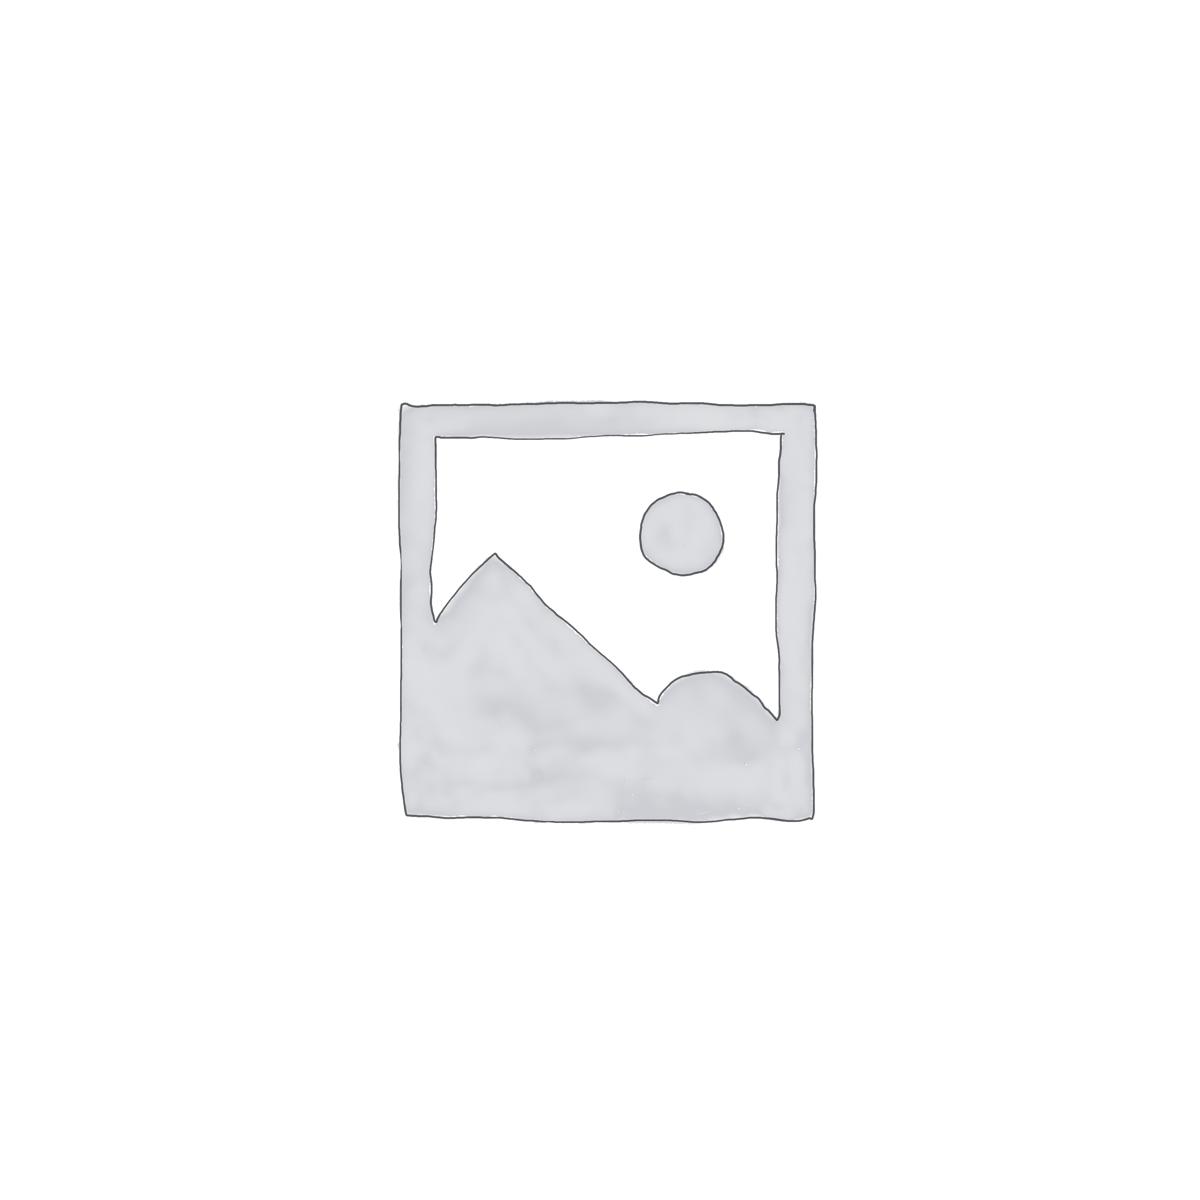 3D Embossed Look Cement Angel Horses Wallpaper Mural